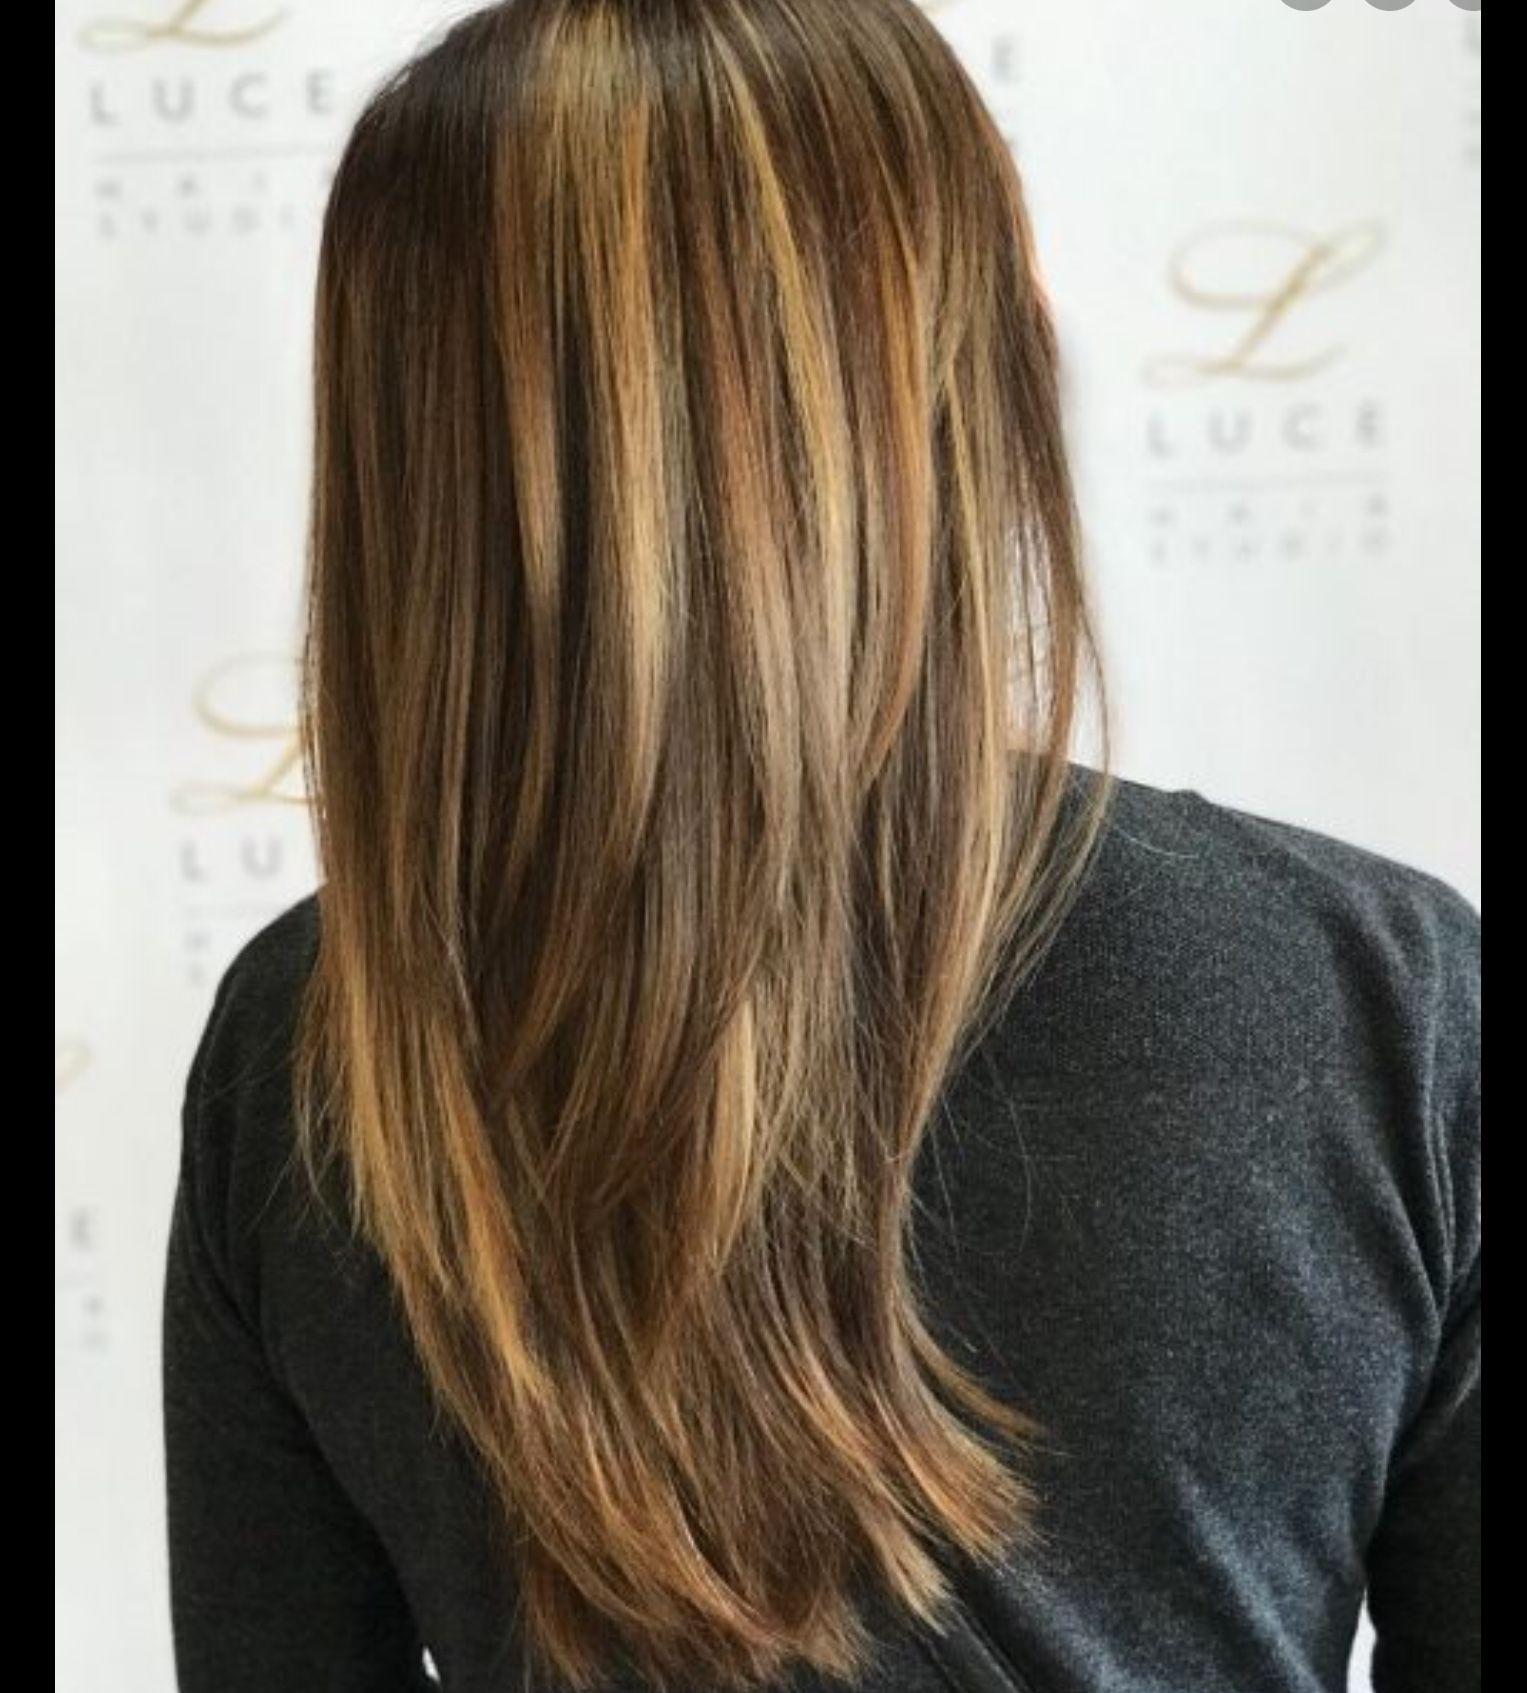 stufenschnitt lange haare v schnitt gestuft - hochsteck